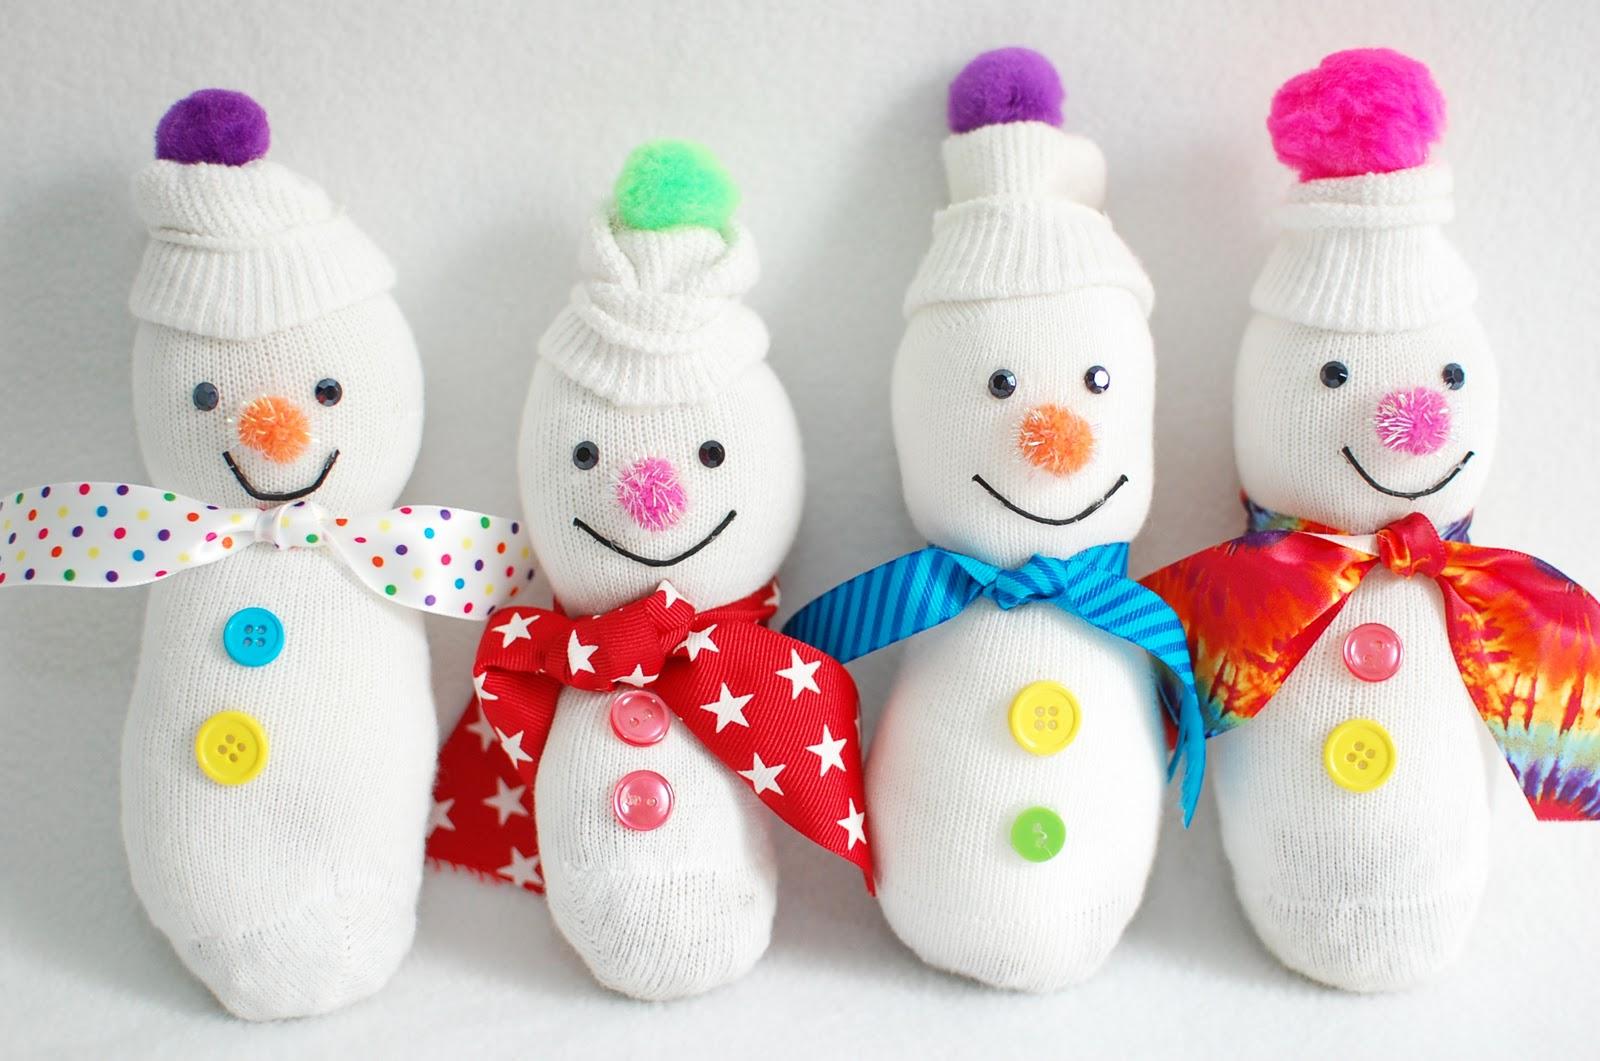 how to make a fake snowman